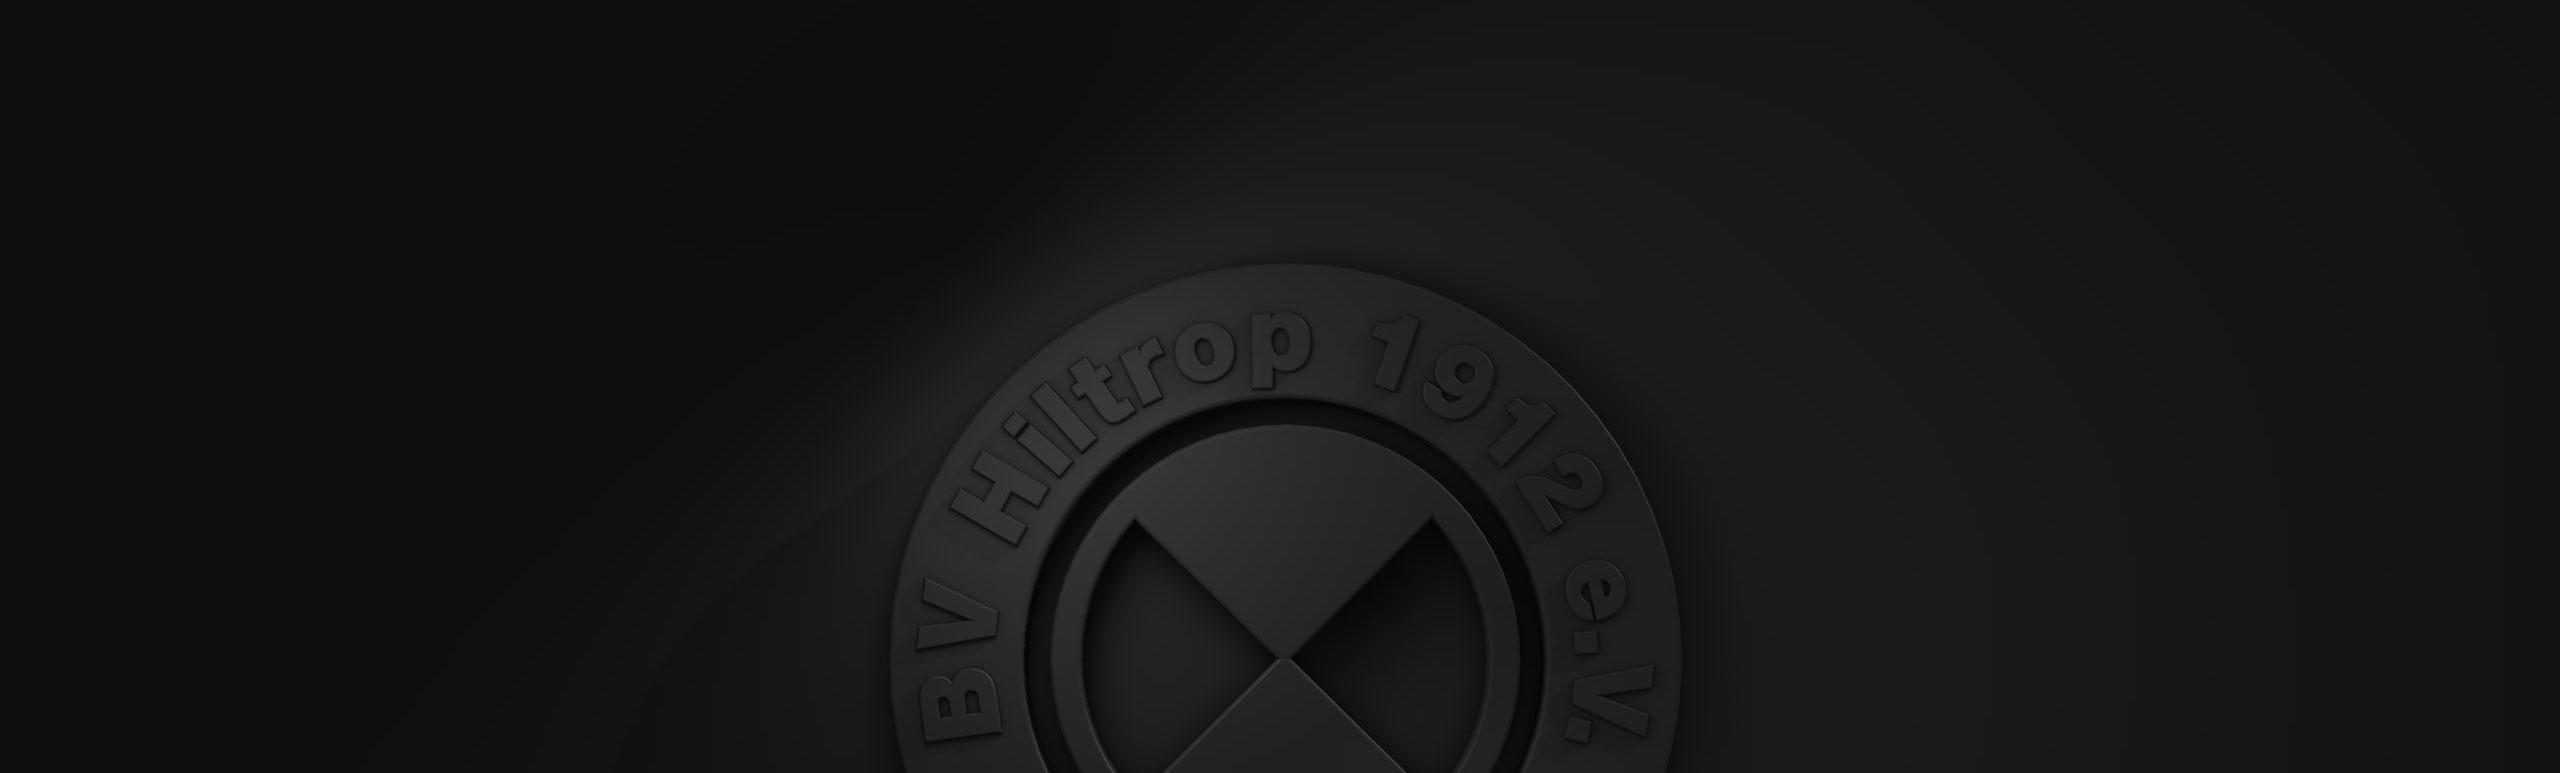 Leitbild BV Hiltrop